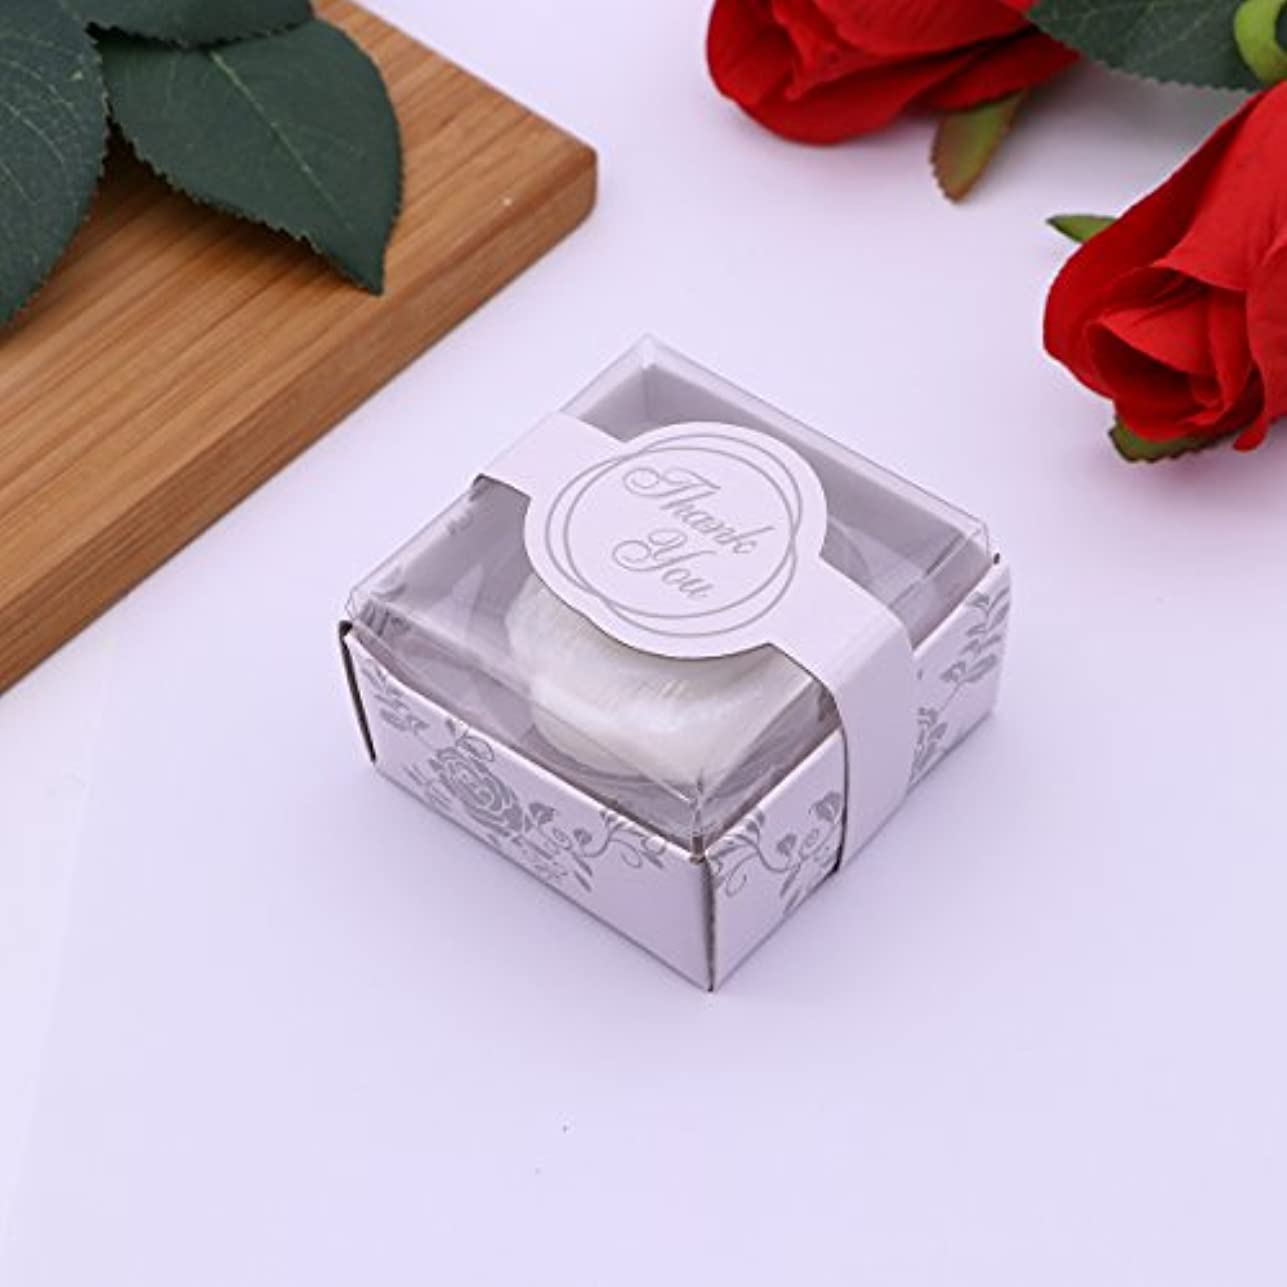 Amosfun 手作り石鹸オイルローズフラワーソープアロマエッセンシャルオイルギフト記念日誕生日結婚式バレンタインデー(ホワイト)20ピース